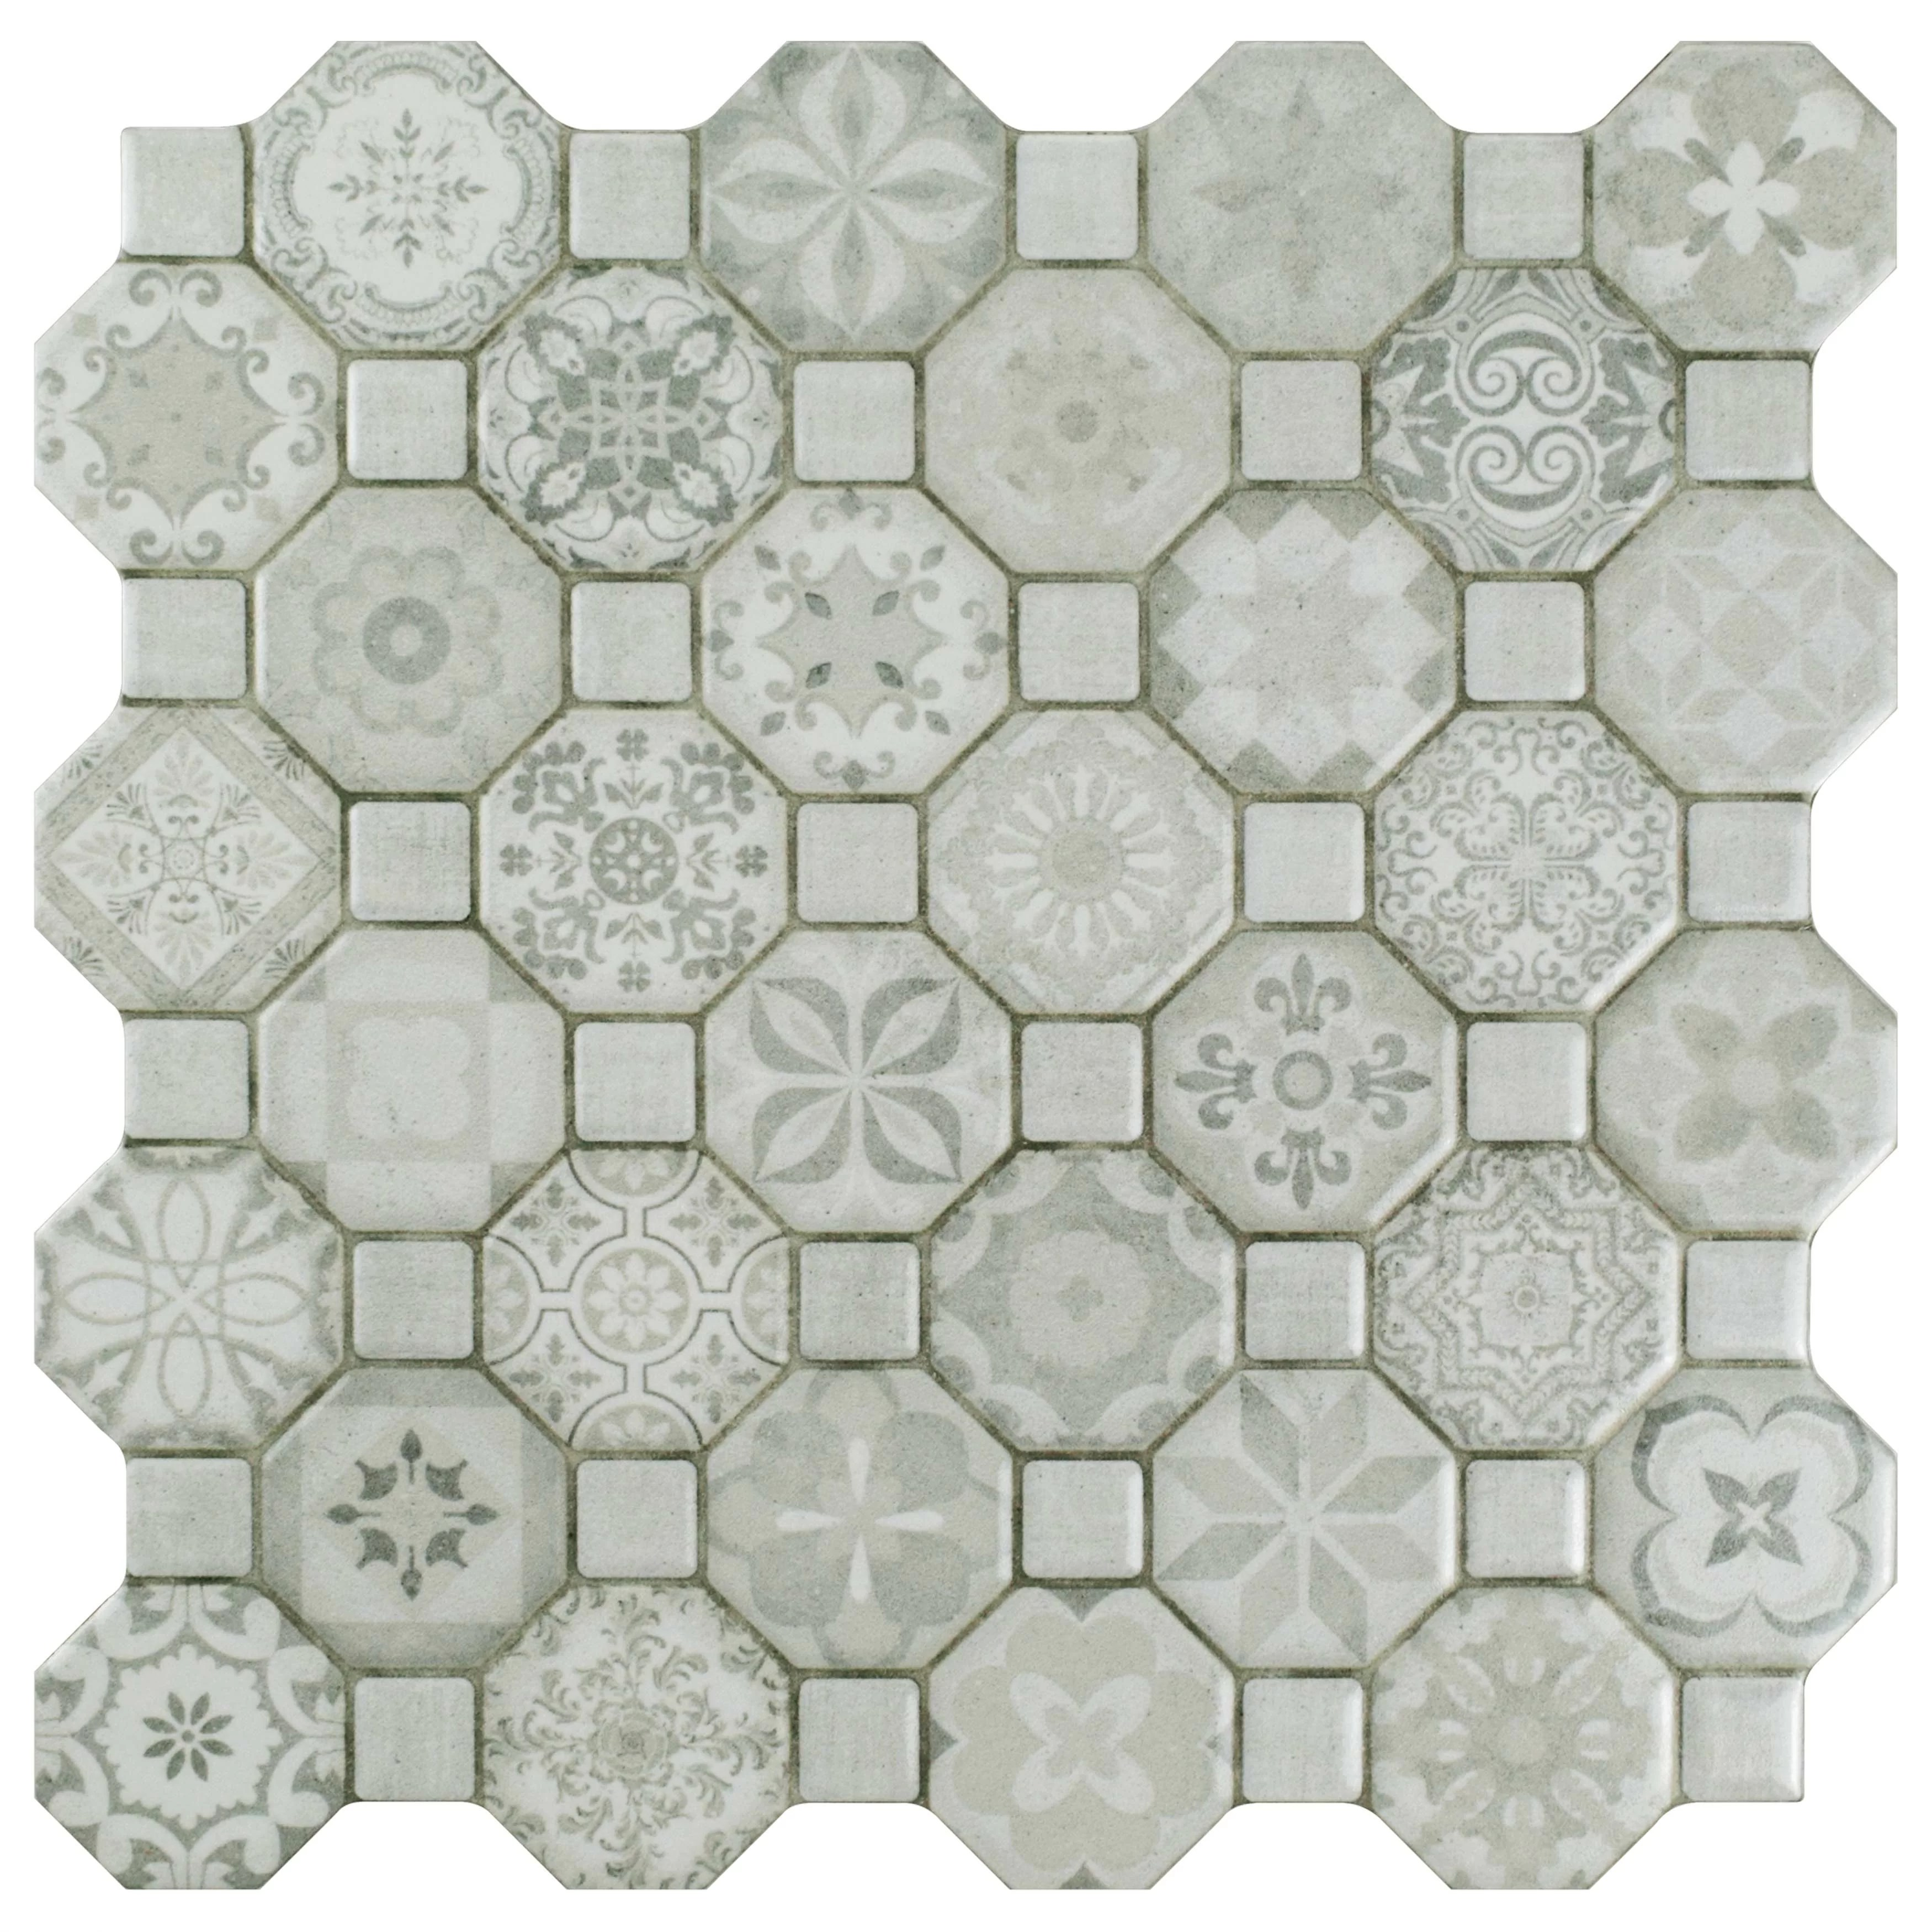 edredon 12 x 12 ceramic octagon and dot mosaic wall floor tile